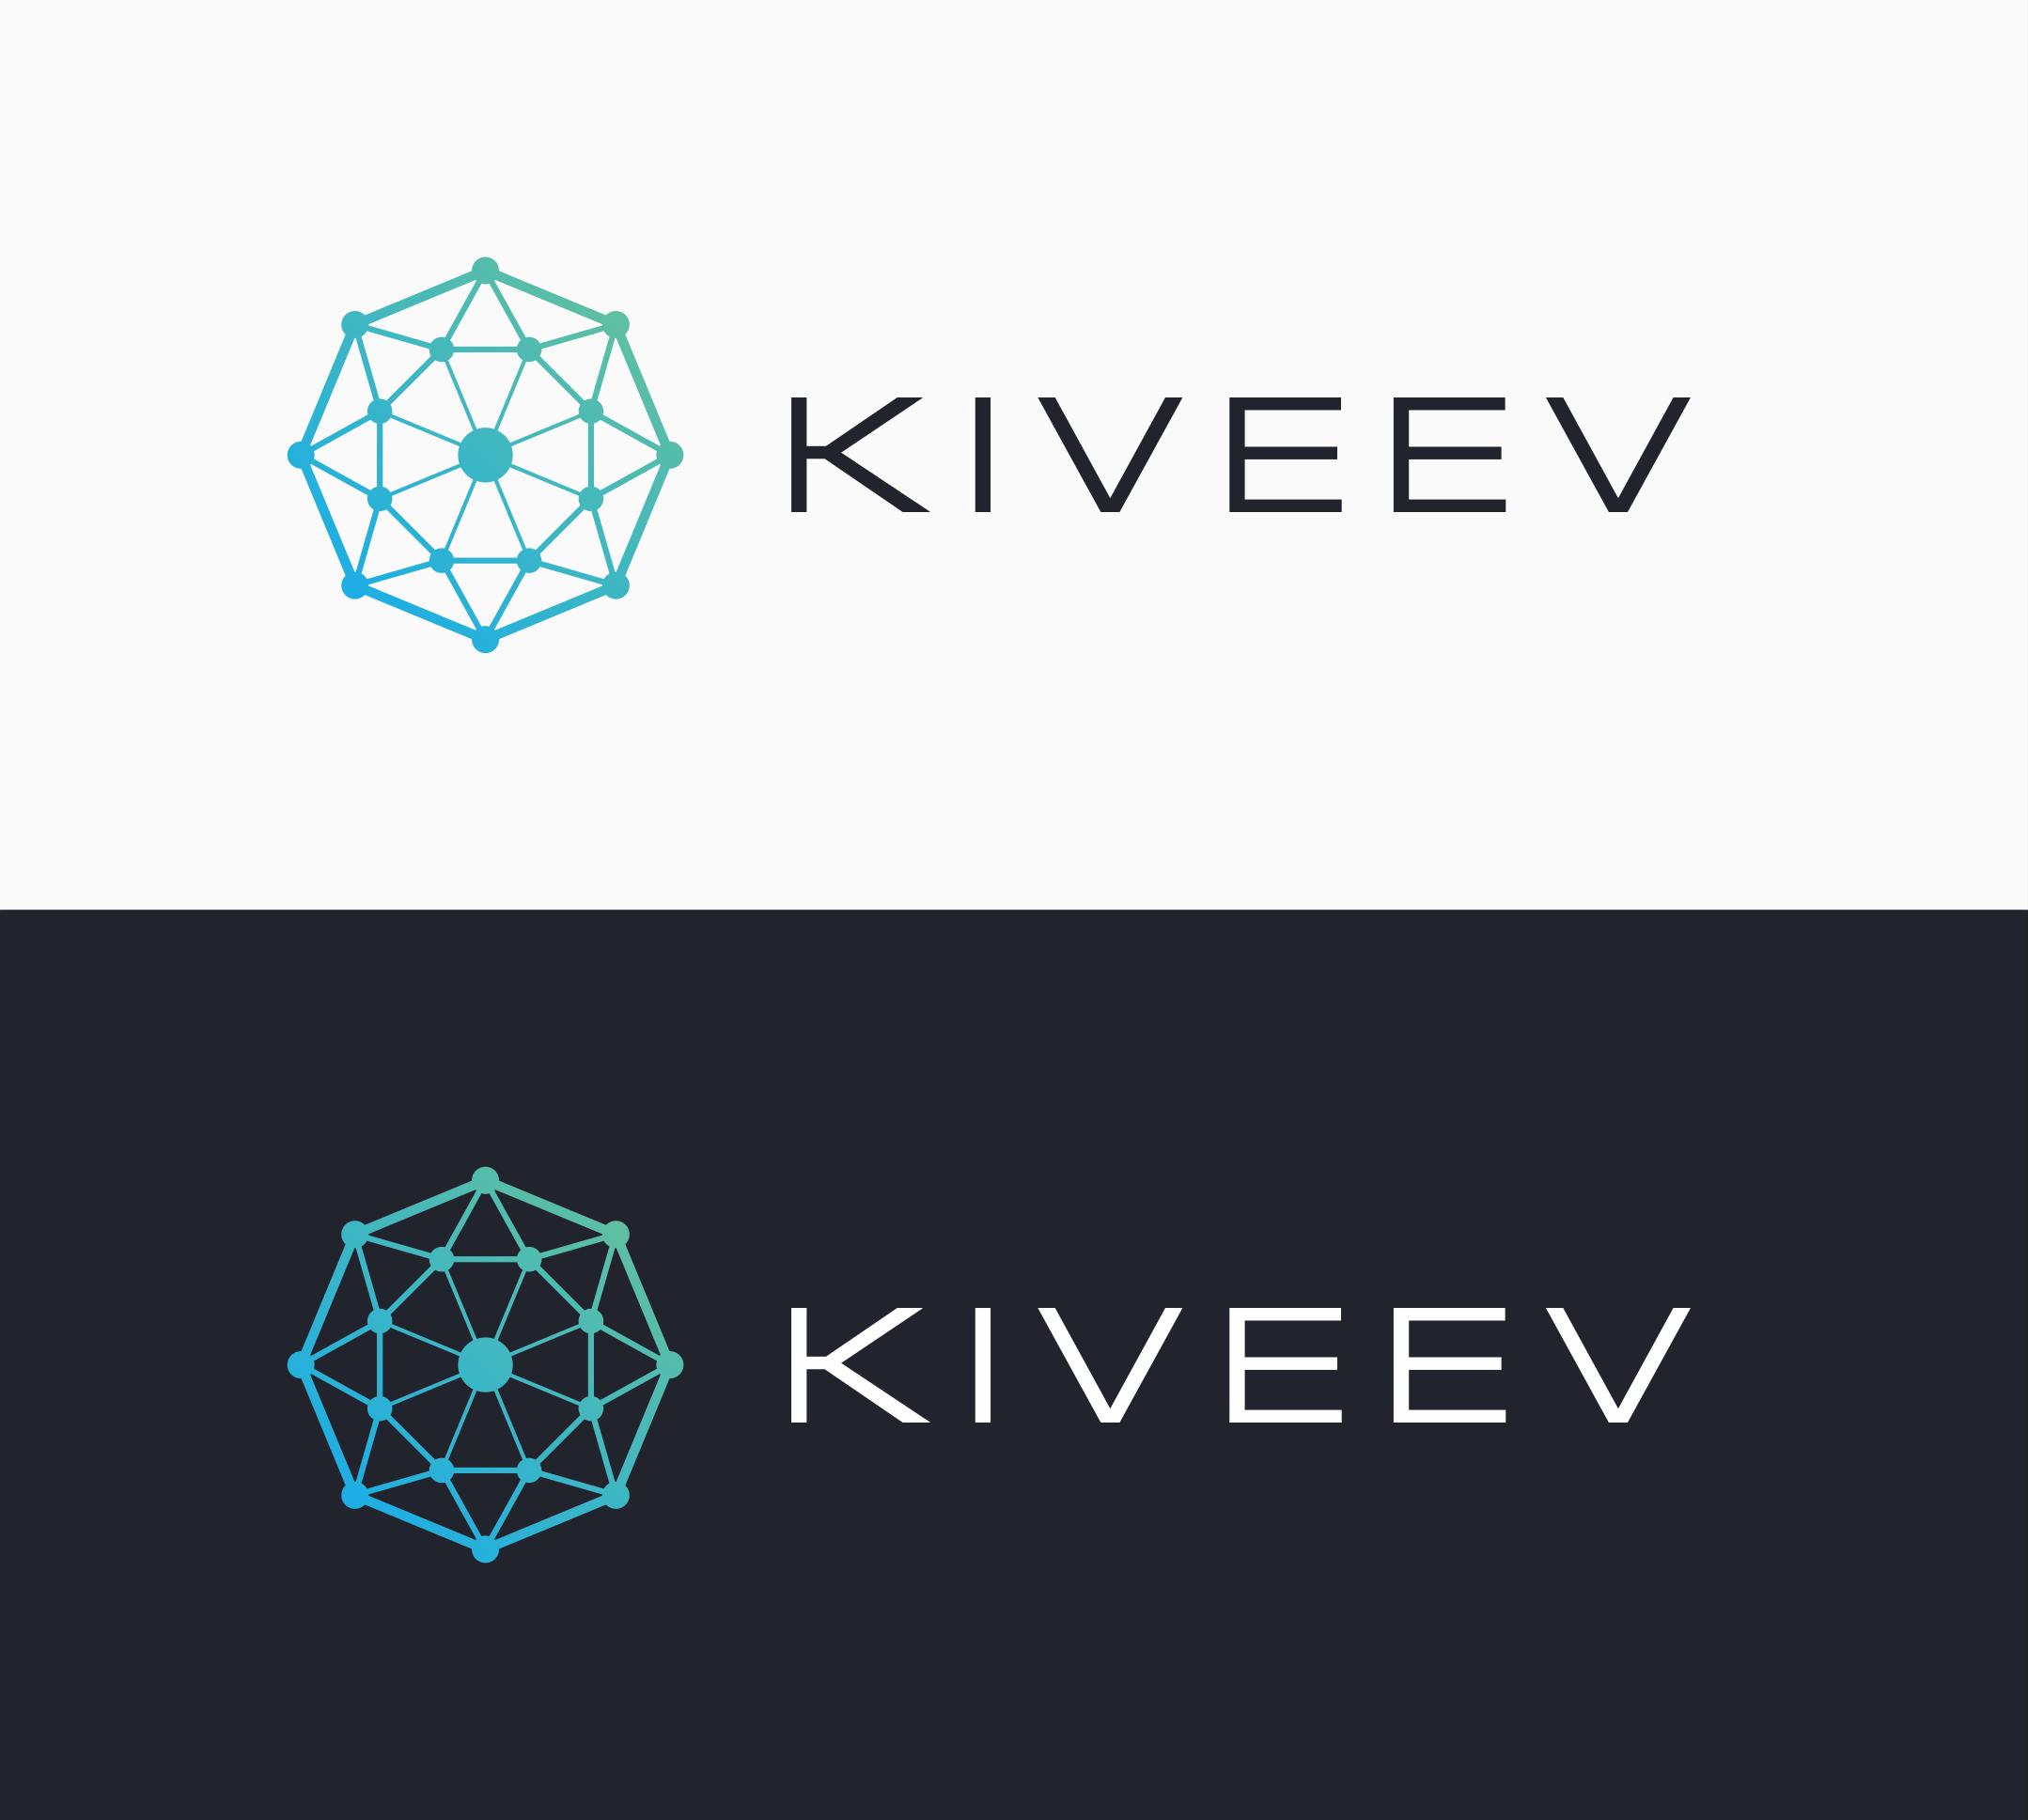 Give Kiveev a Logo - Global Energy Trading Platform